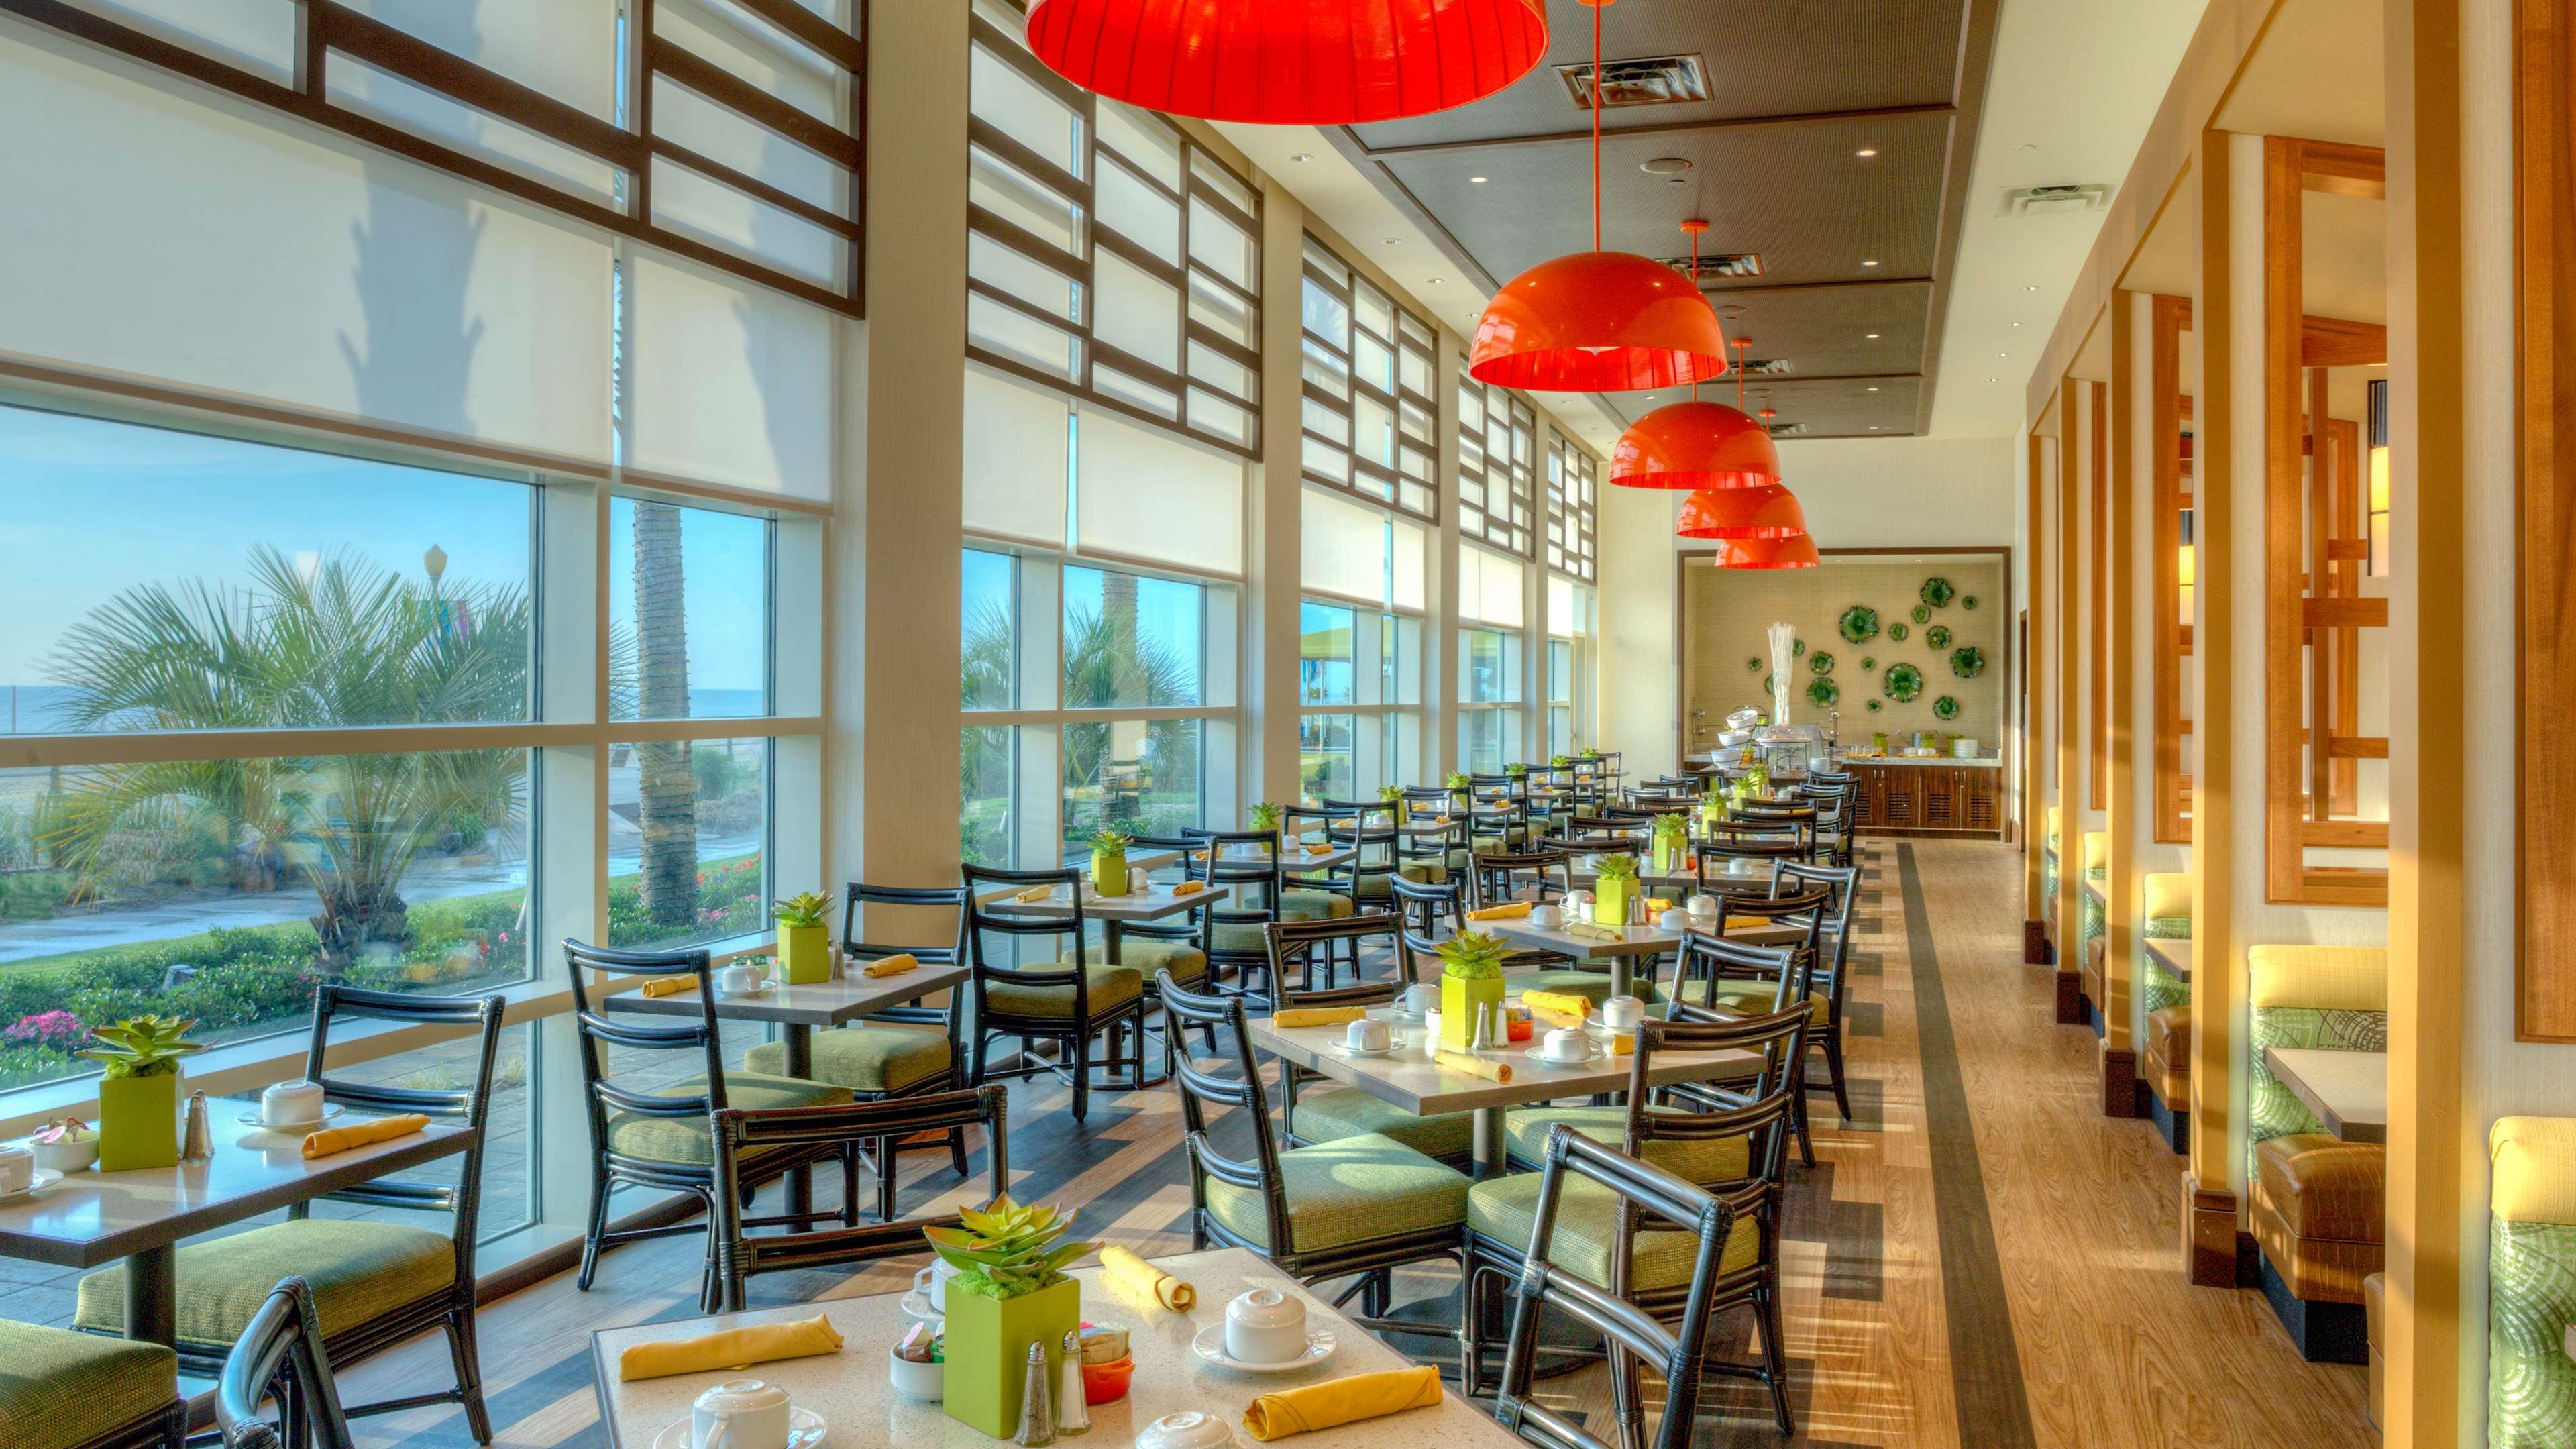 Hilton Garden Inn Virginia Beach Oceanfront image 16